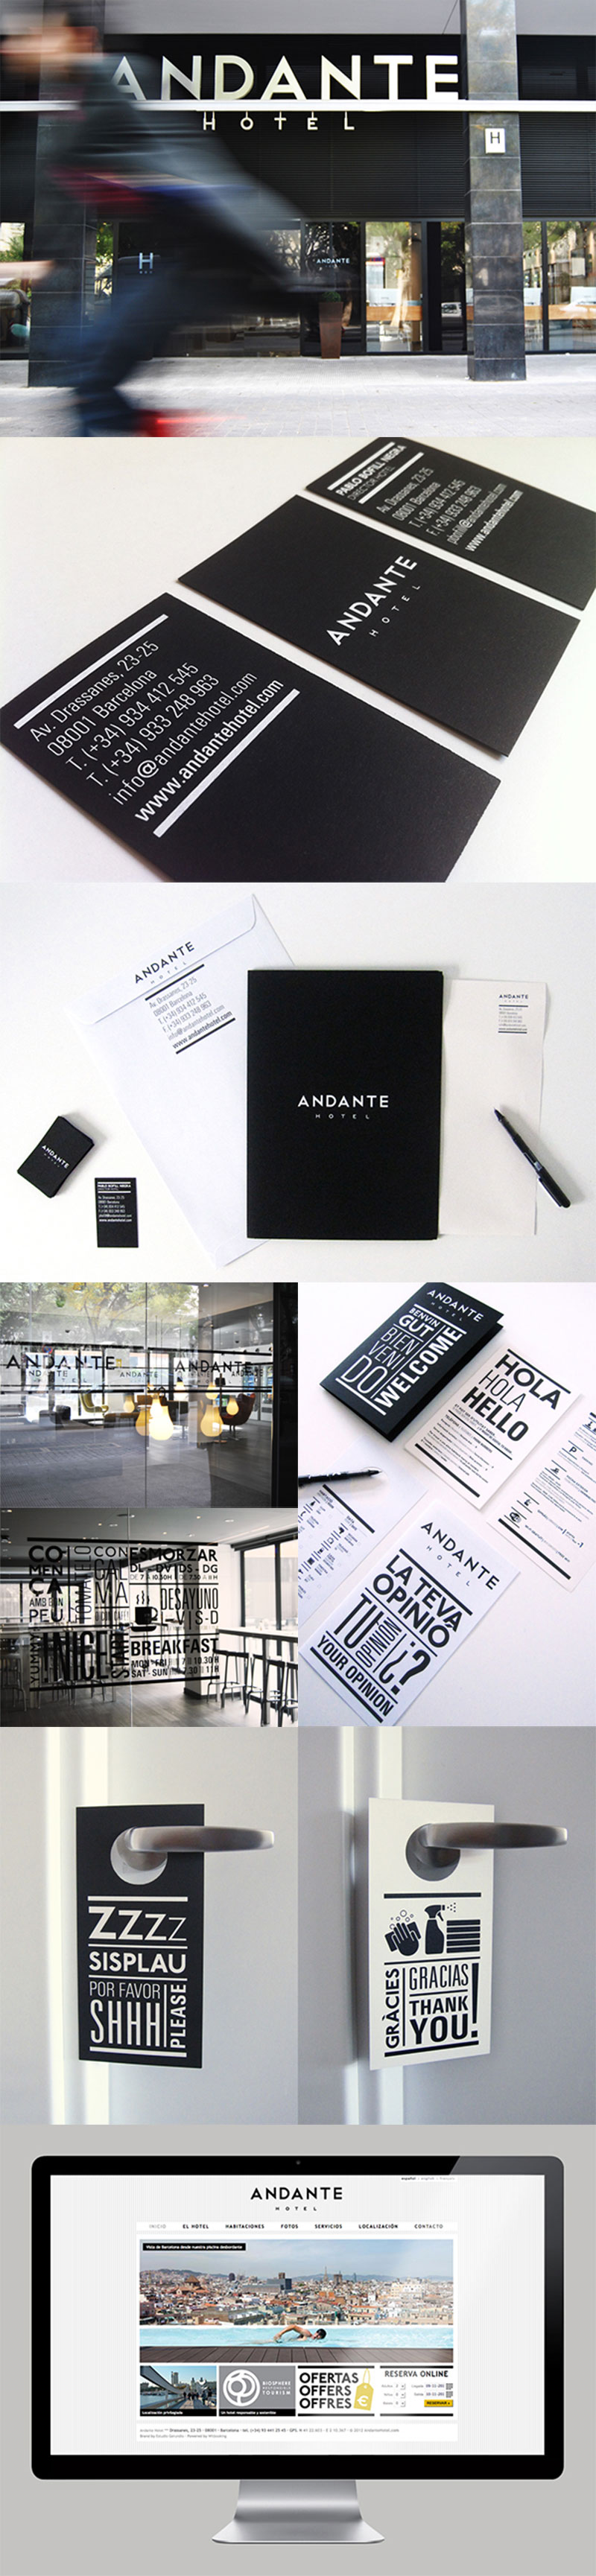 Andante Hotel by Gerundio Lorena Alonso Noblom